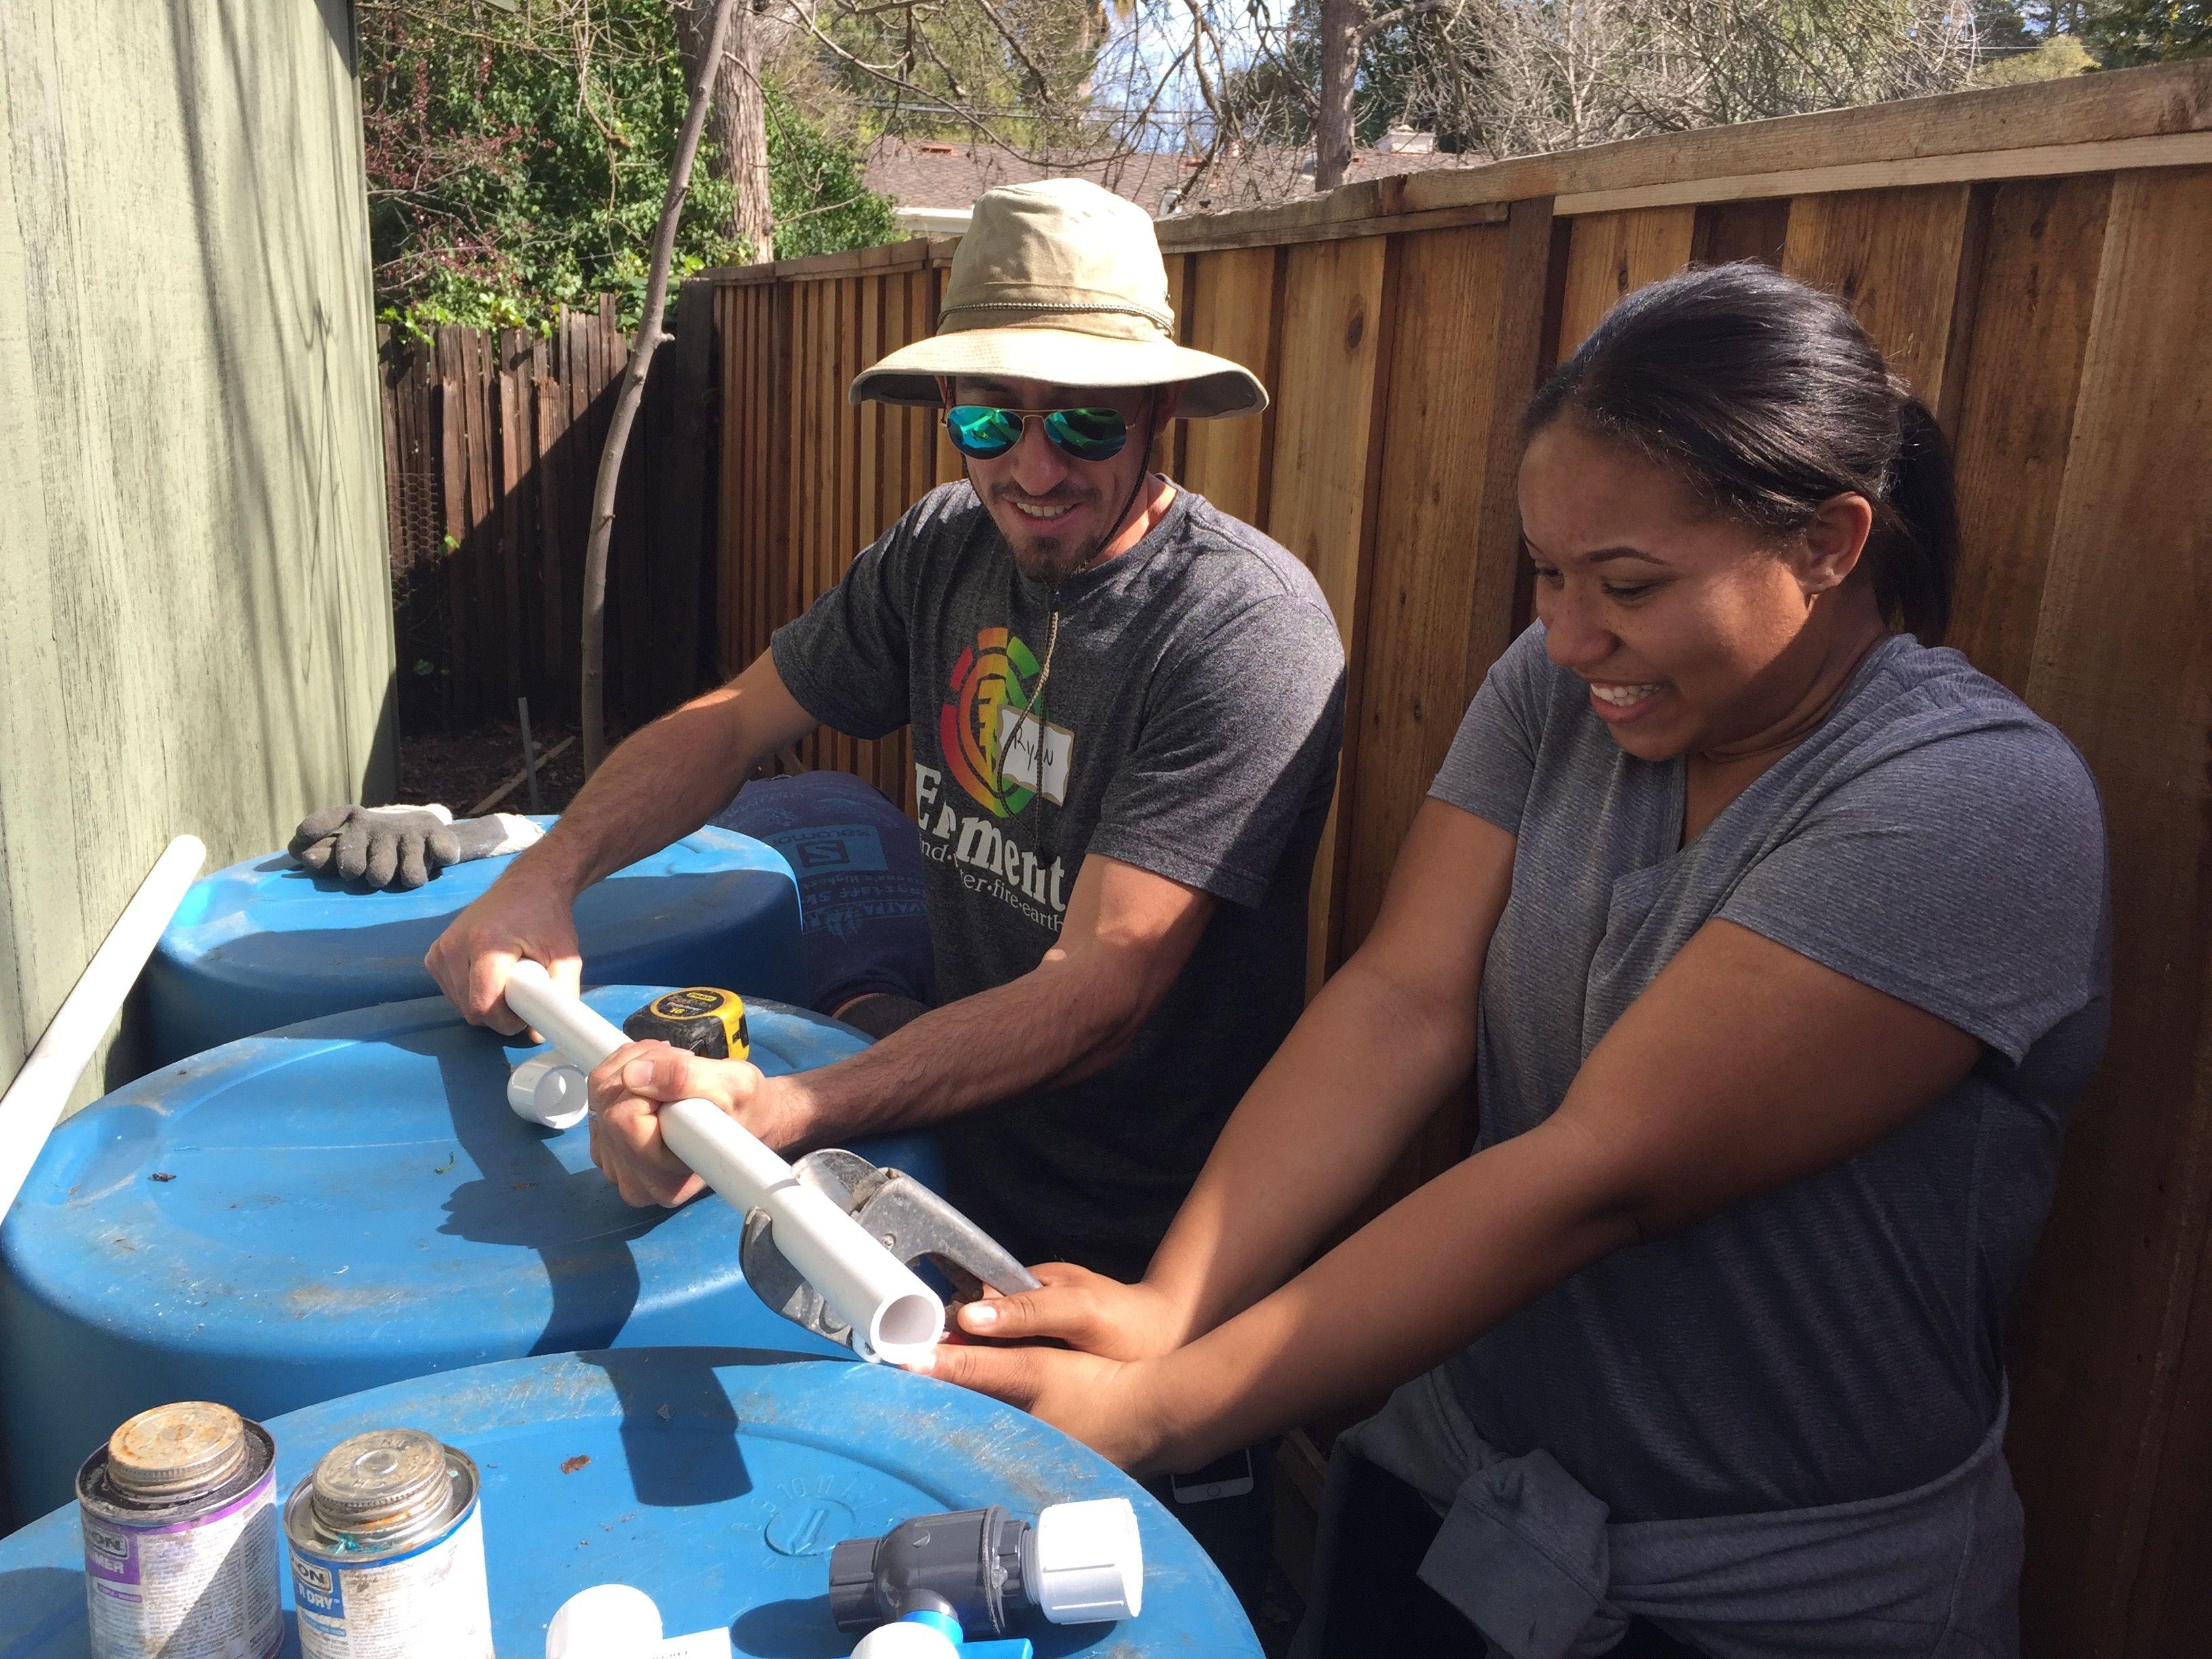 Landscape designer Ryan Kelsey shows Zakeisha Plummer how to cut PVC piping for a backyard rainwater capture system in Walnut Creek.